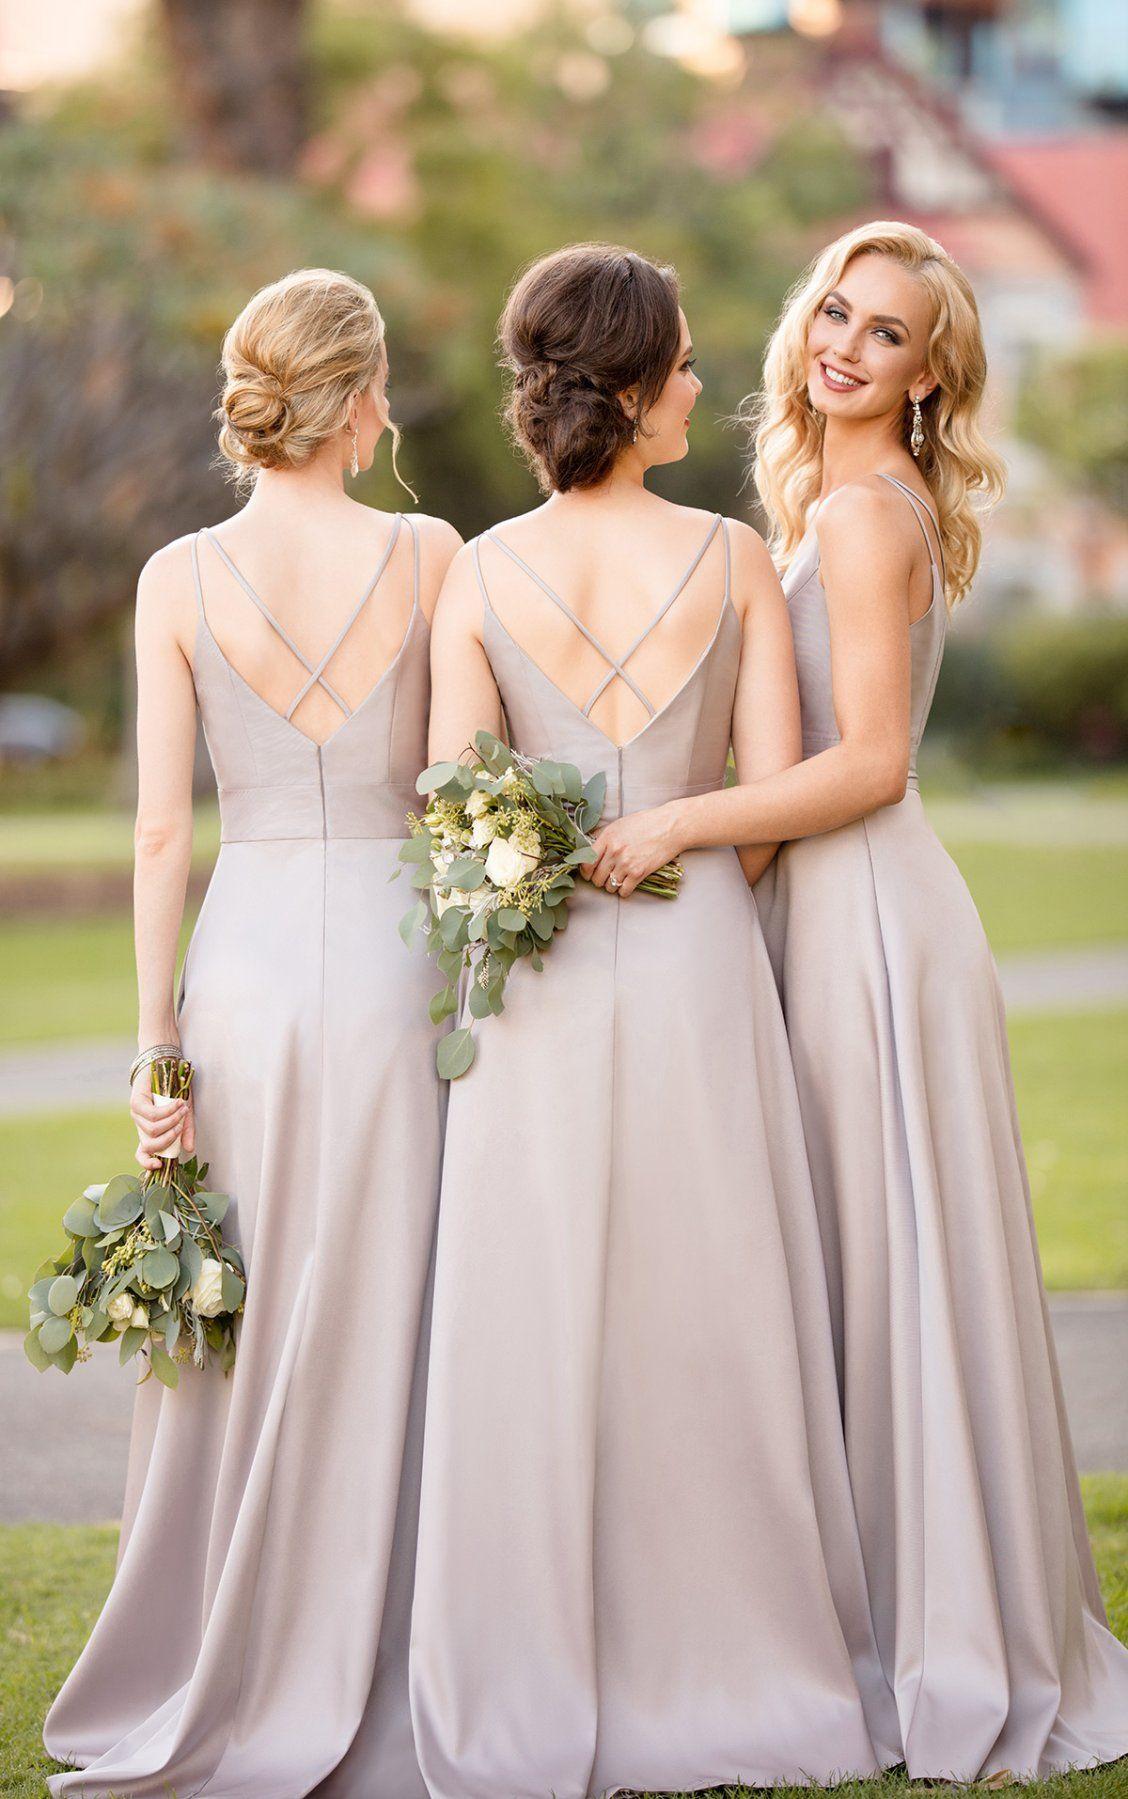 Essense wedding dress  Sorella Vita Bridesmaid Dresses Are The New Classic  Bridesmaids